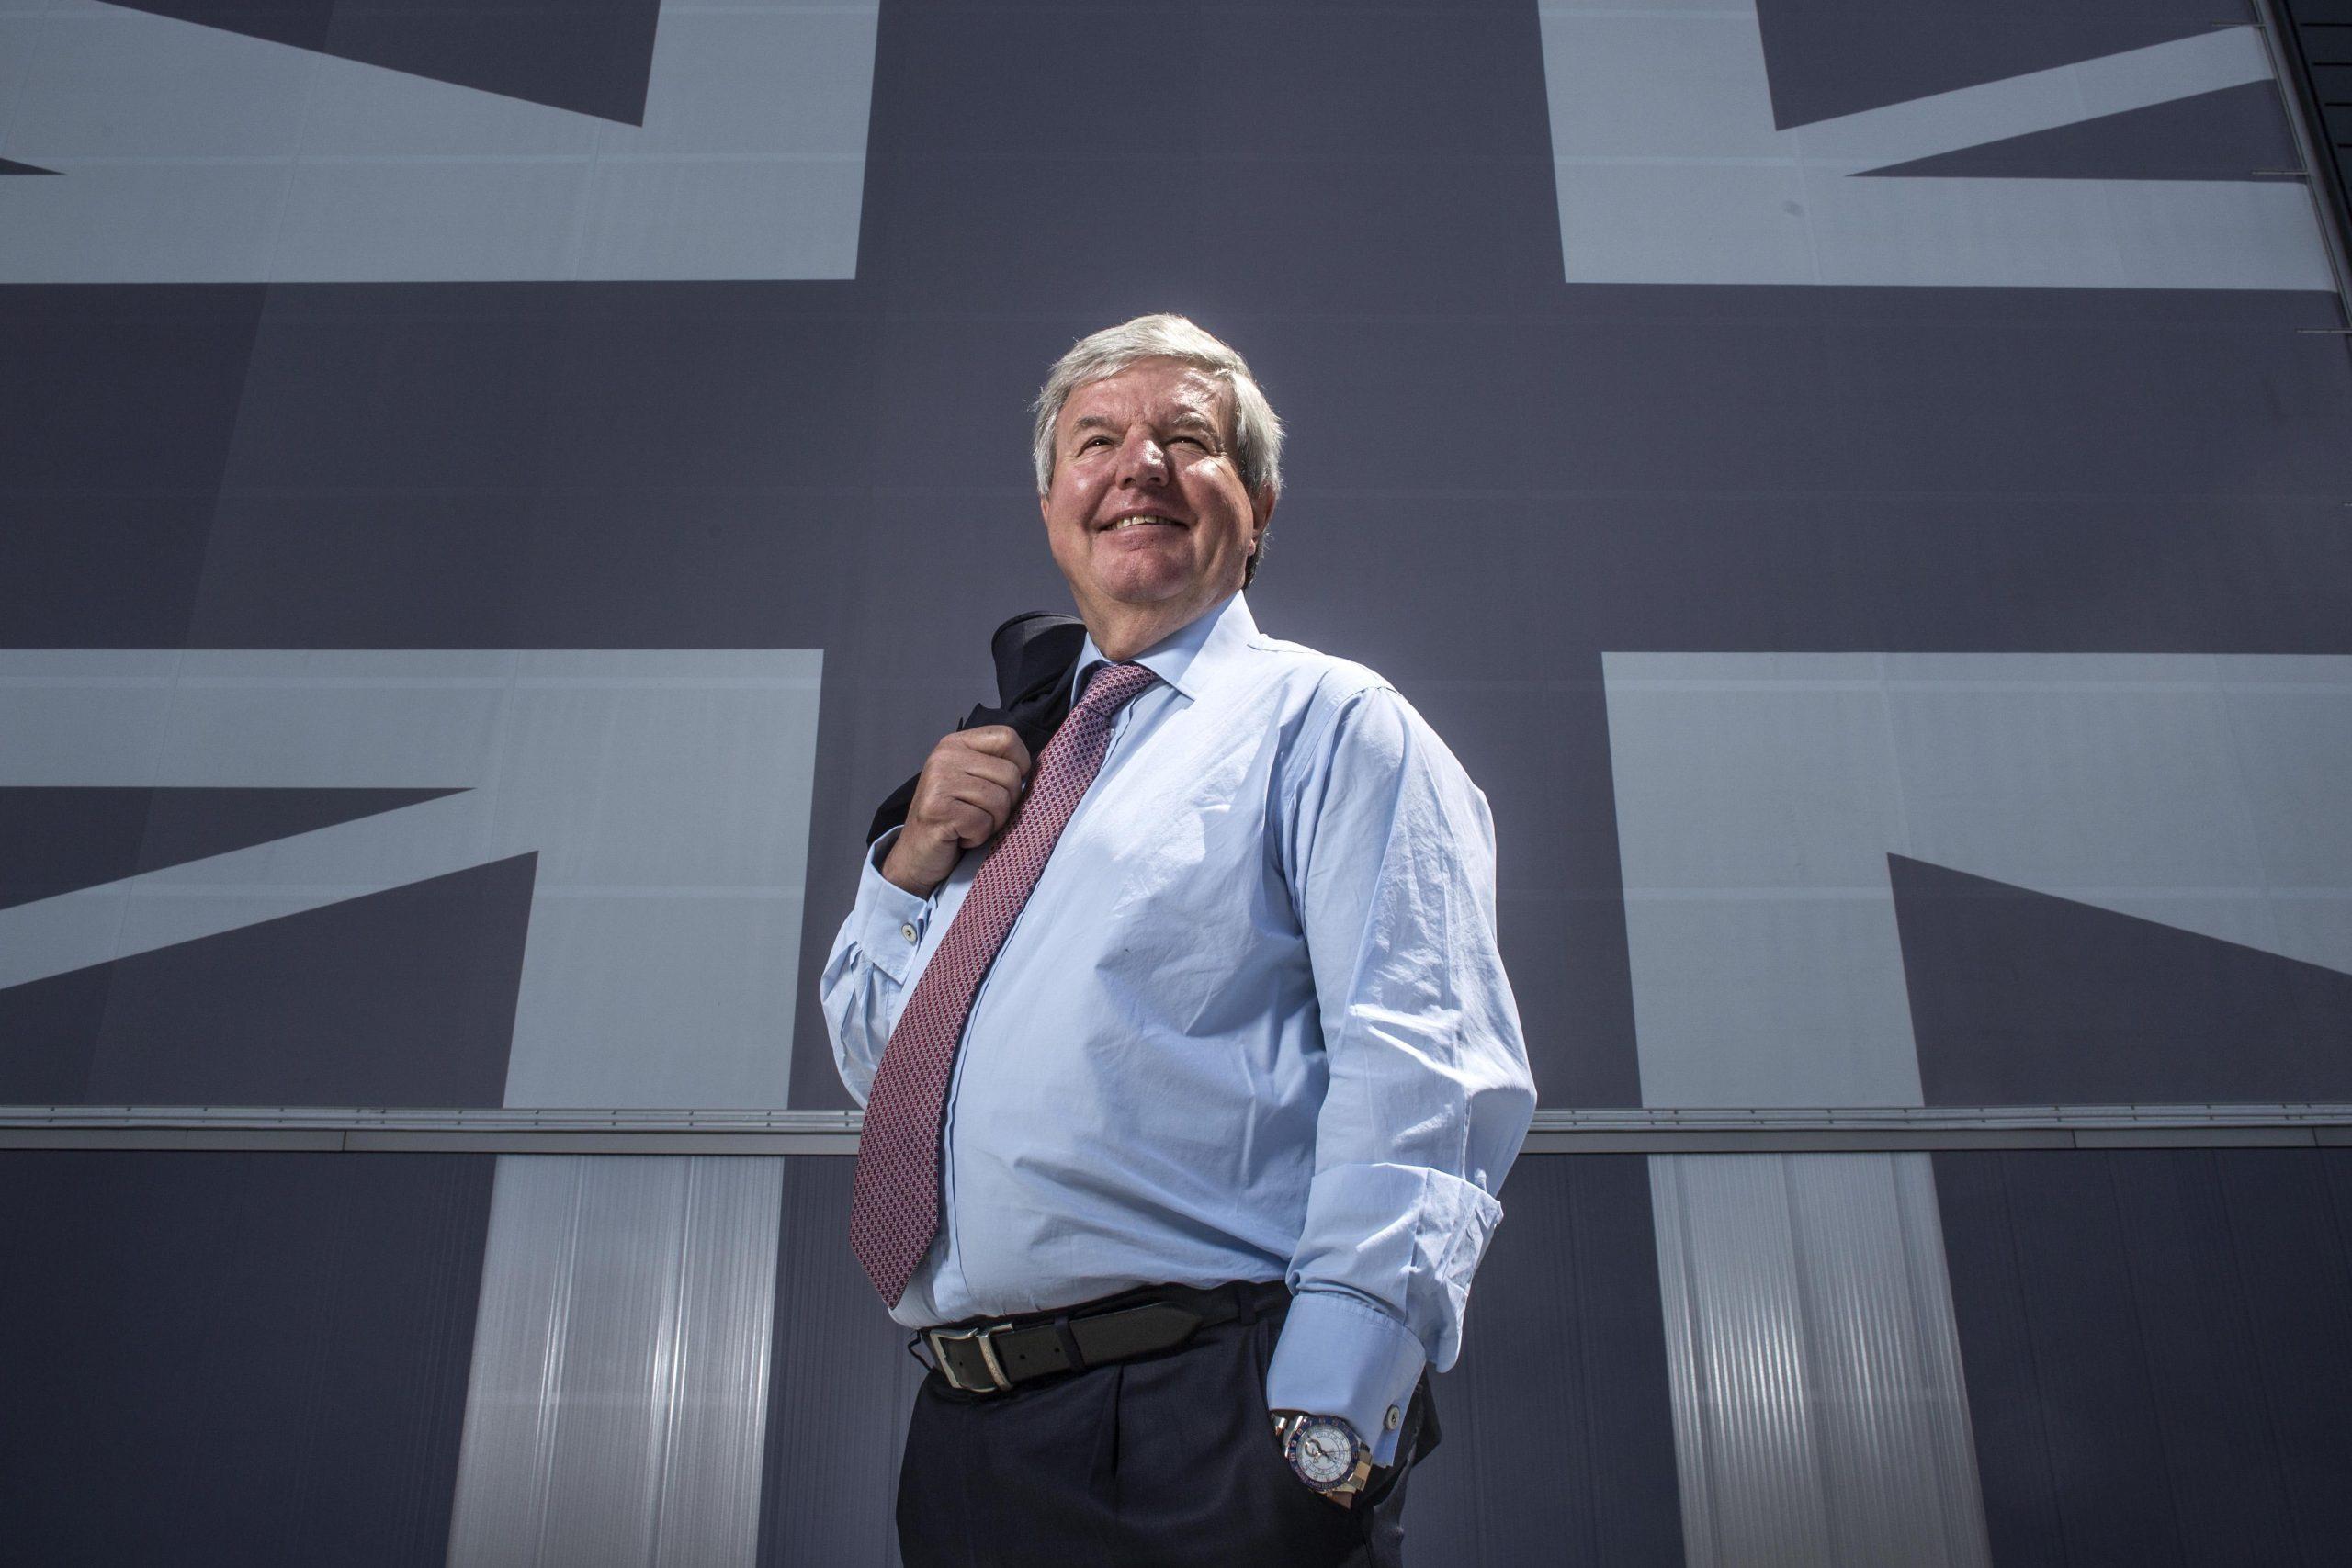 Sir Keith Mills Apoointed SAZKA 'Bid Chair' For National Lottery